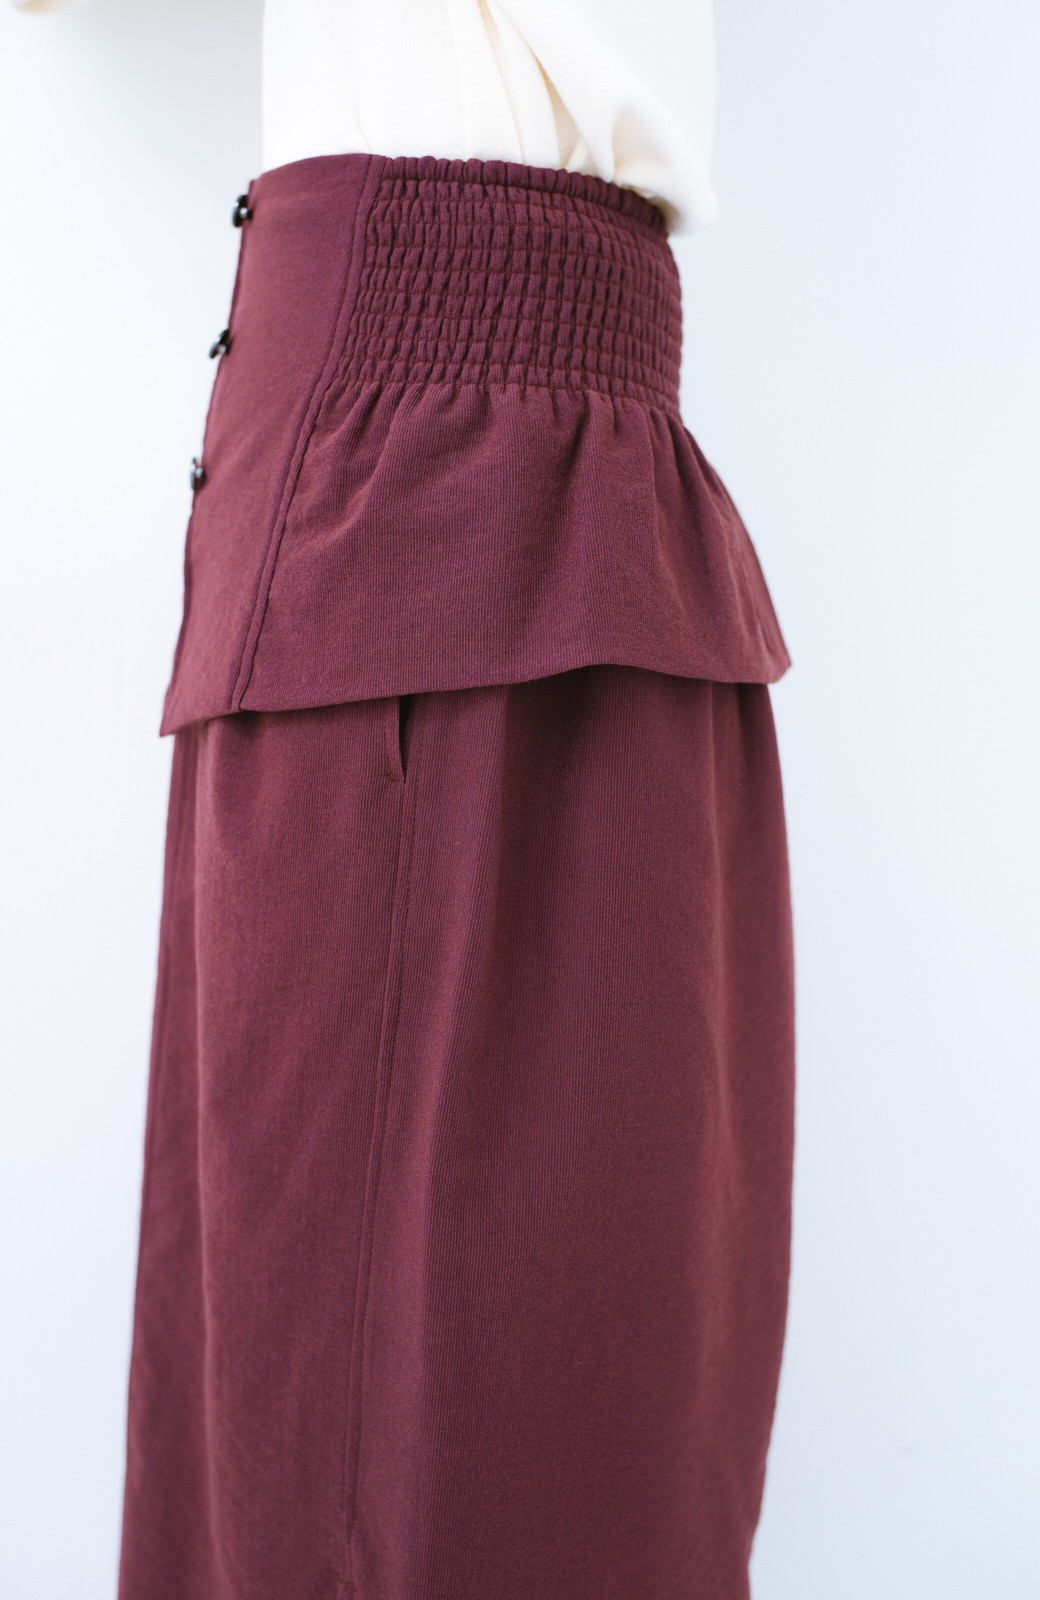 haco!  腹巻きとは呼ばせない ブルー期も華やかに過ごせる消臭加工裏地付きフリルデザインスカートセット【ブルー期】女の子バンザイ!プロジェクト <ボルドー>の商品写真13